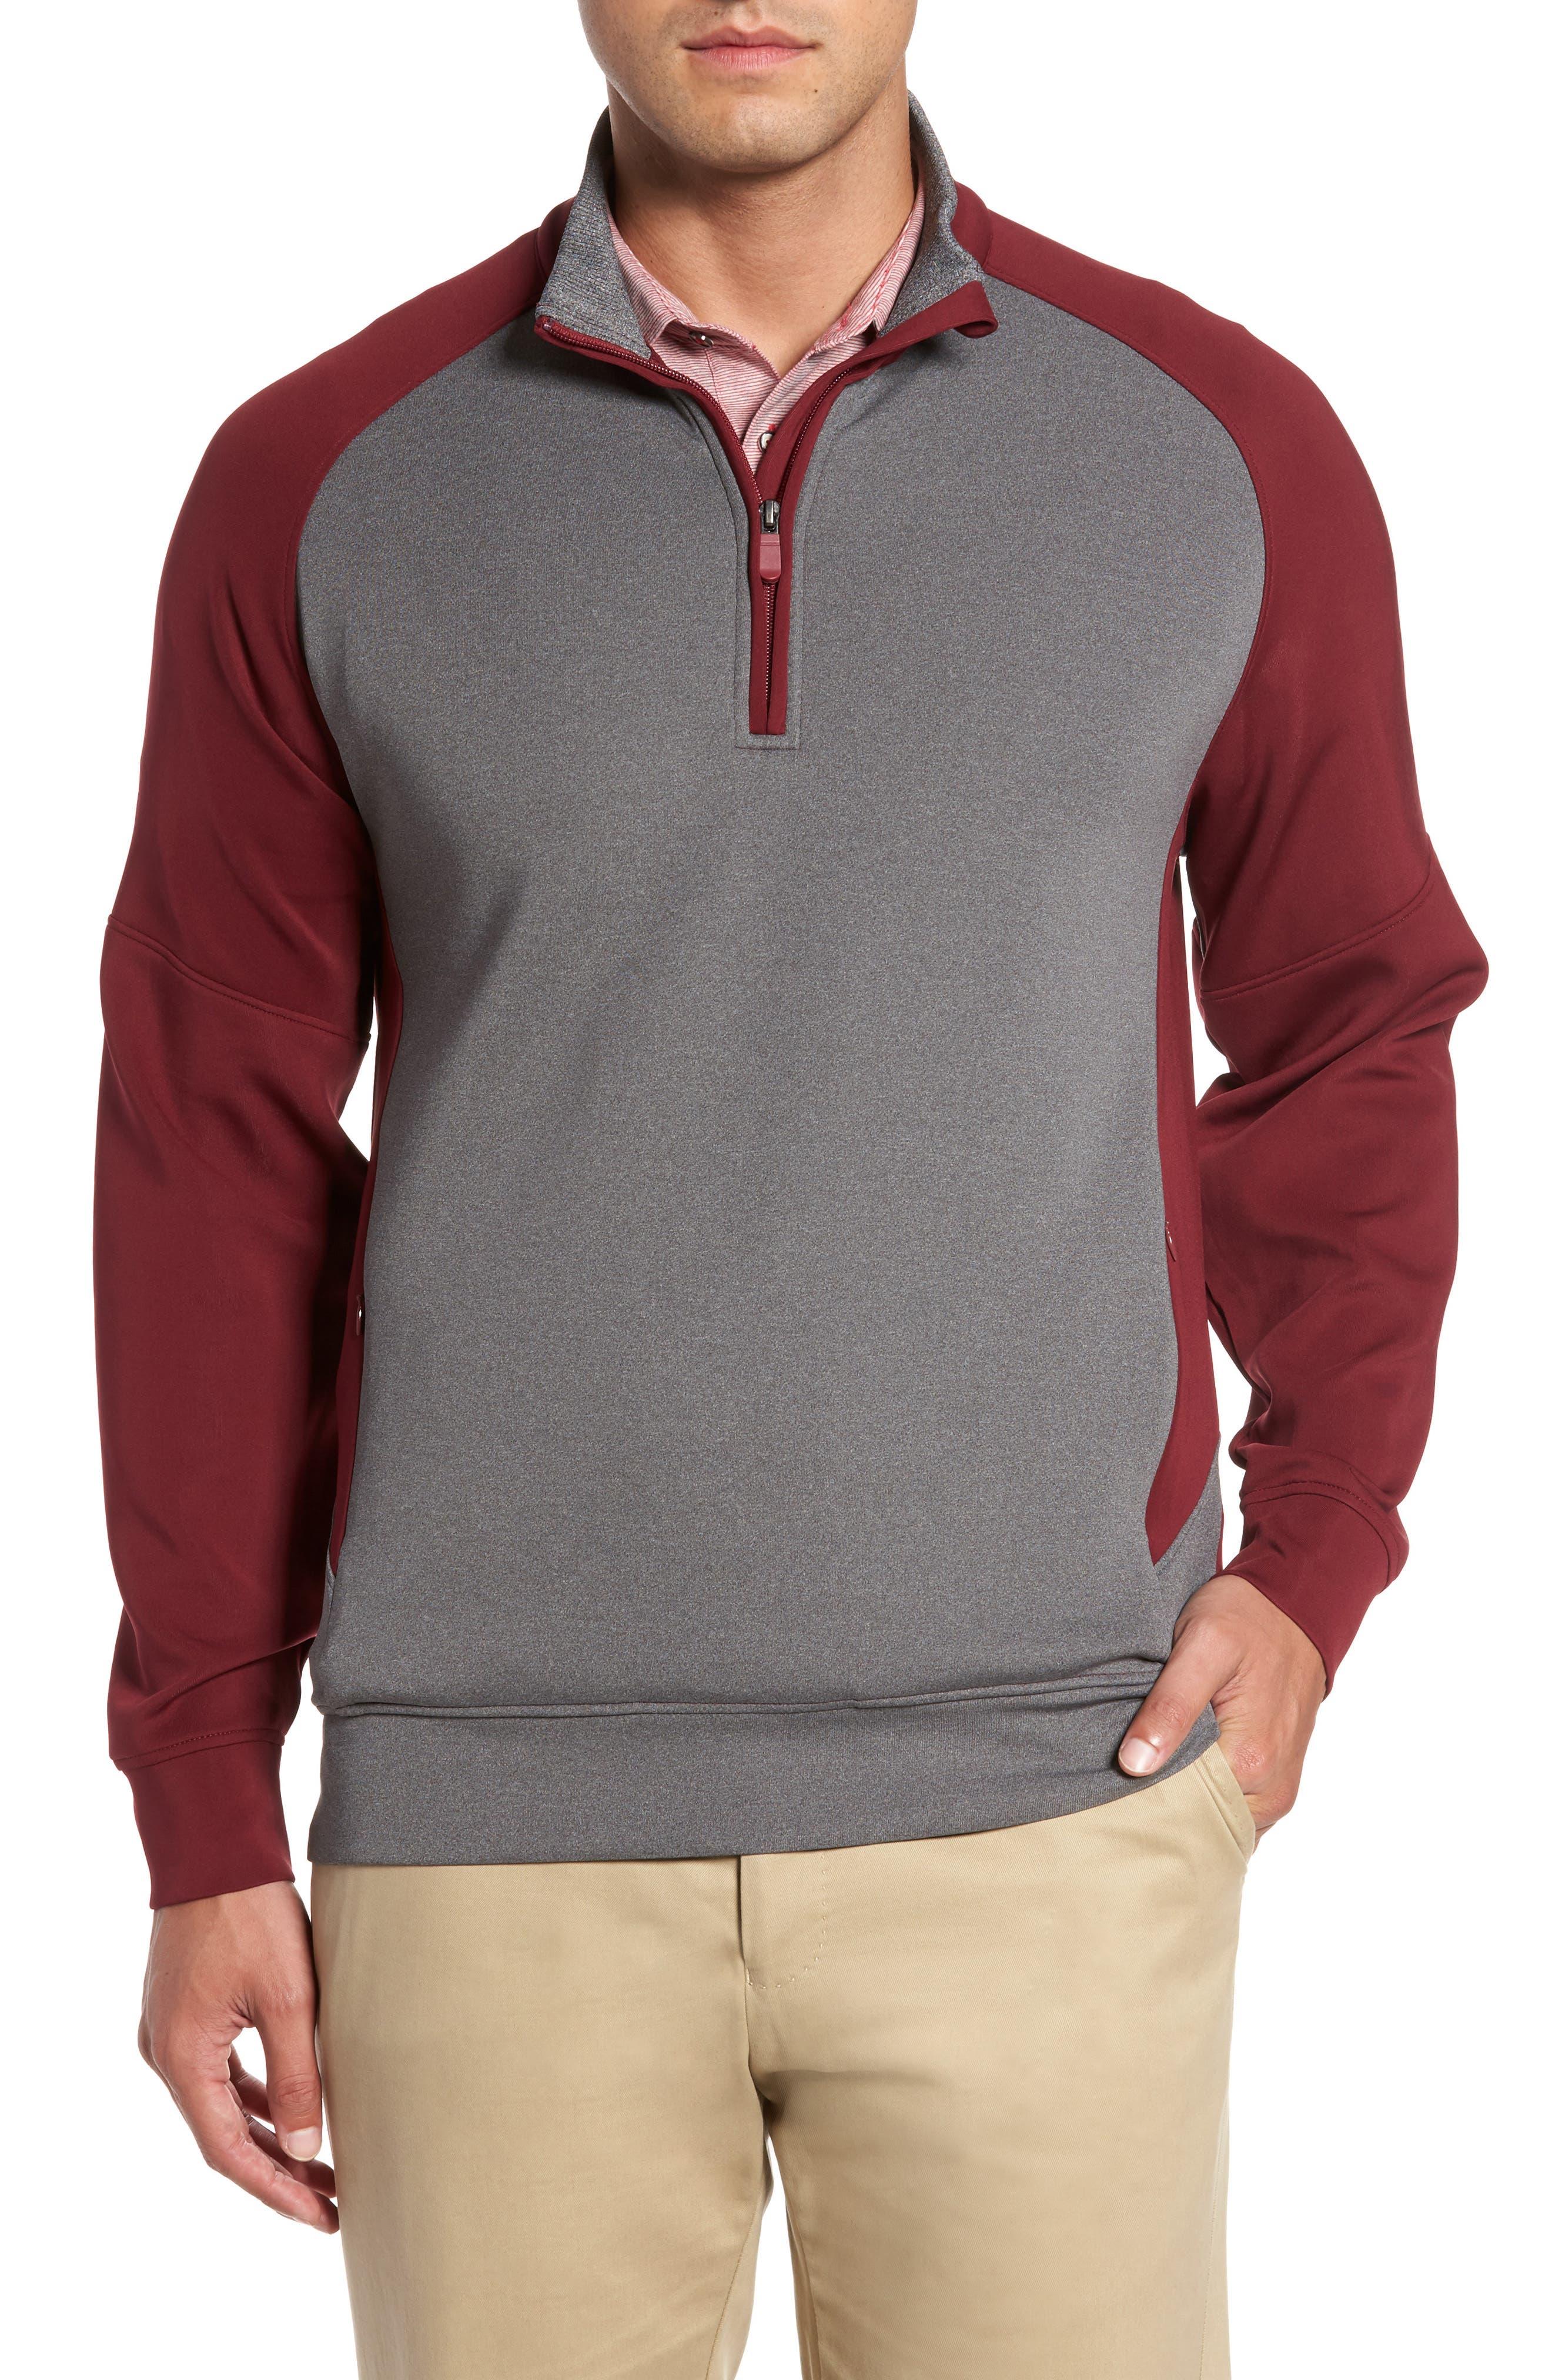 R18 Chapman Tech Quarter Zip Pullover,                         Main,                         color, Oxblood